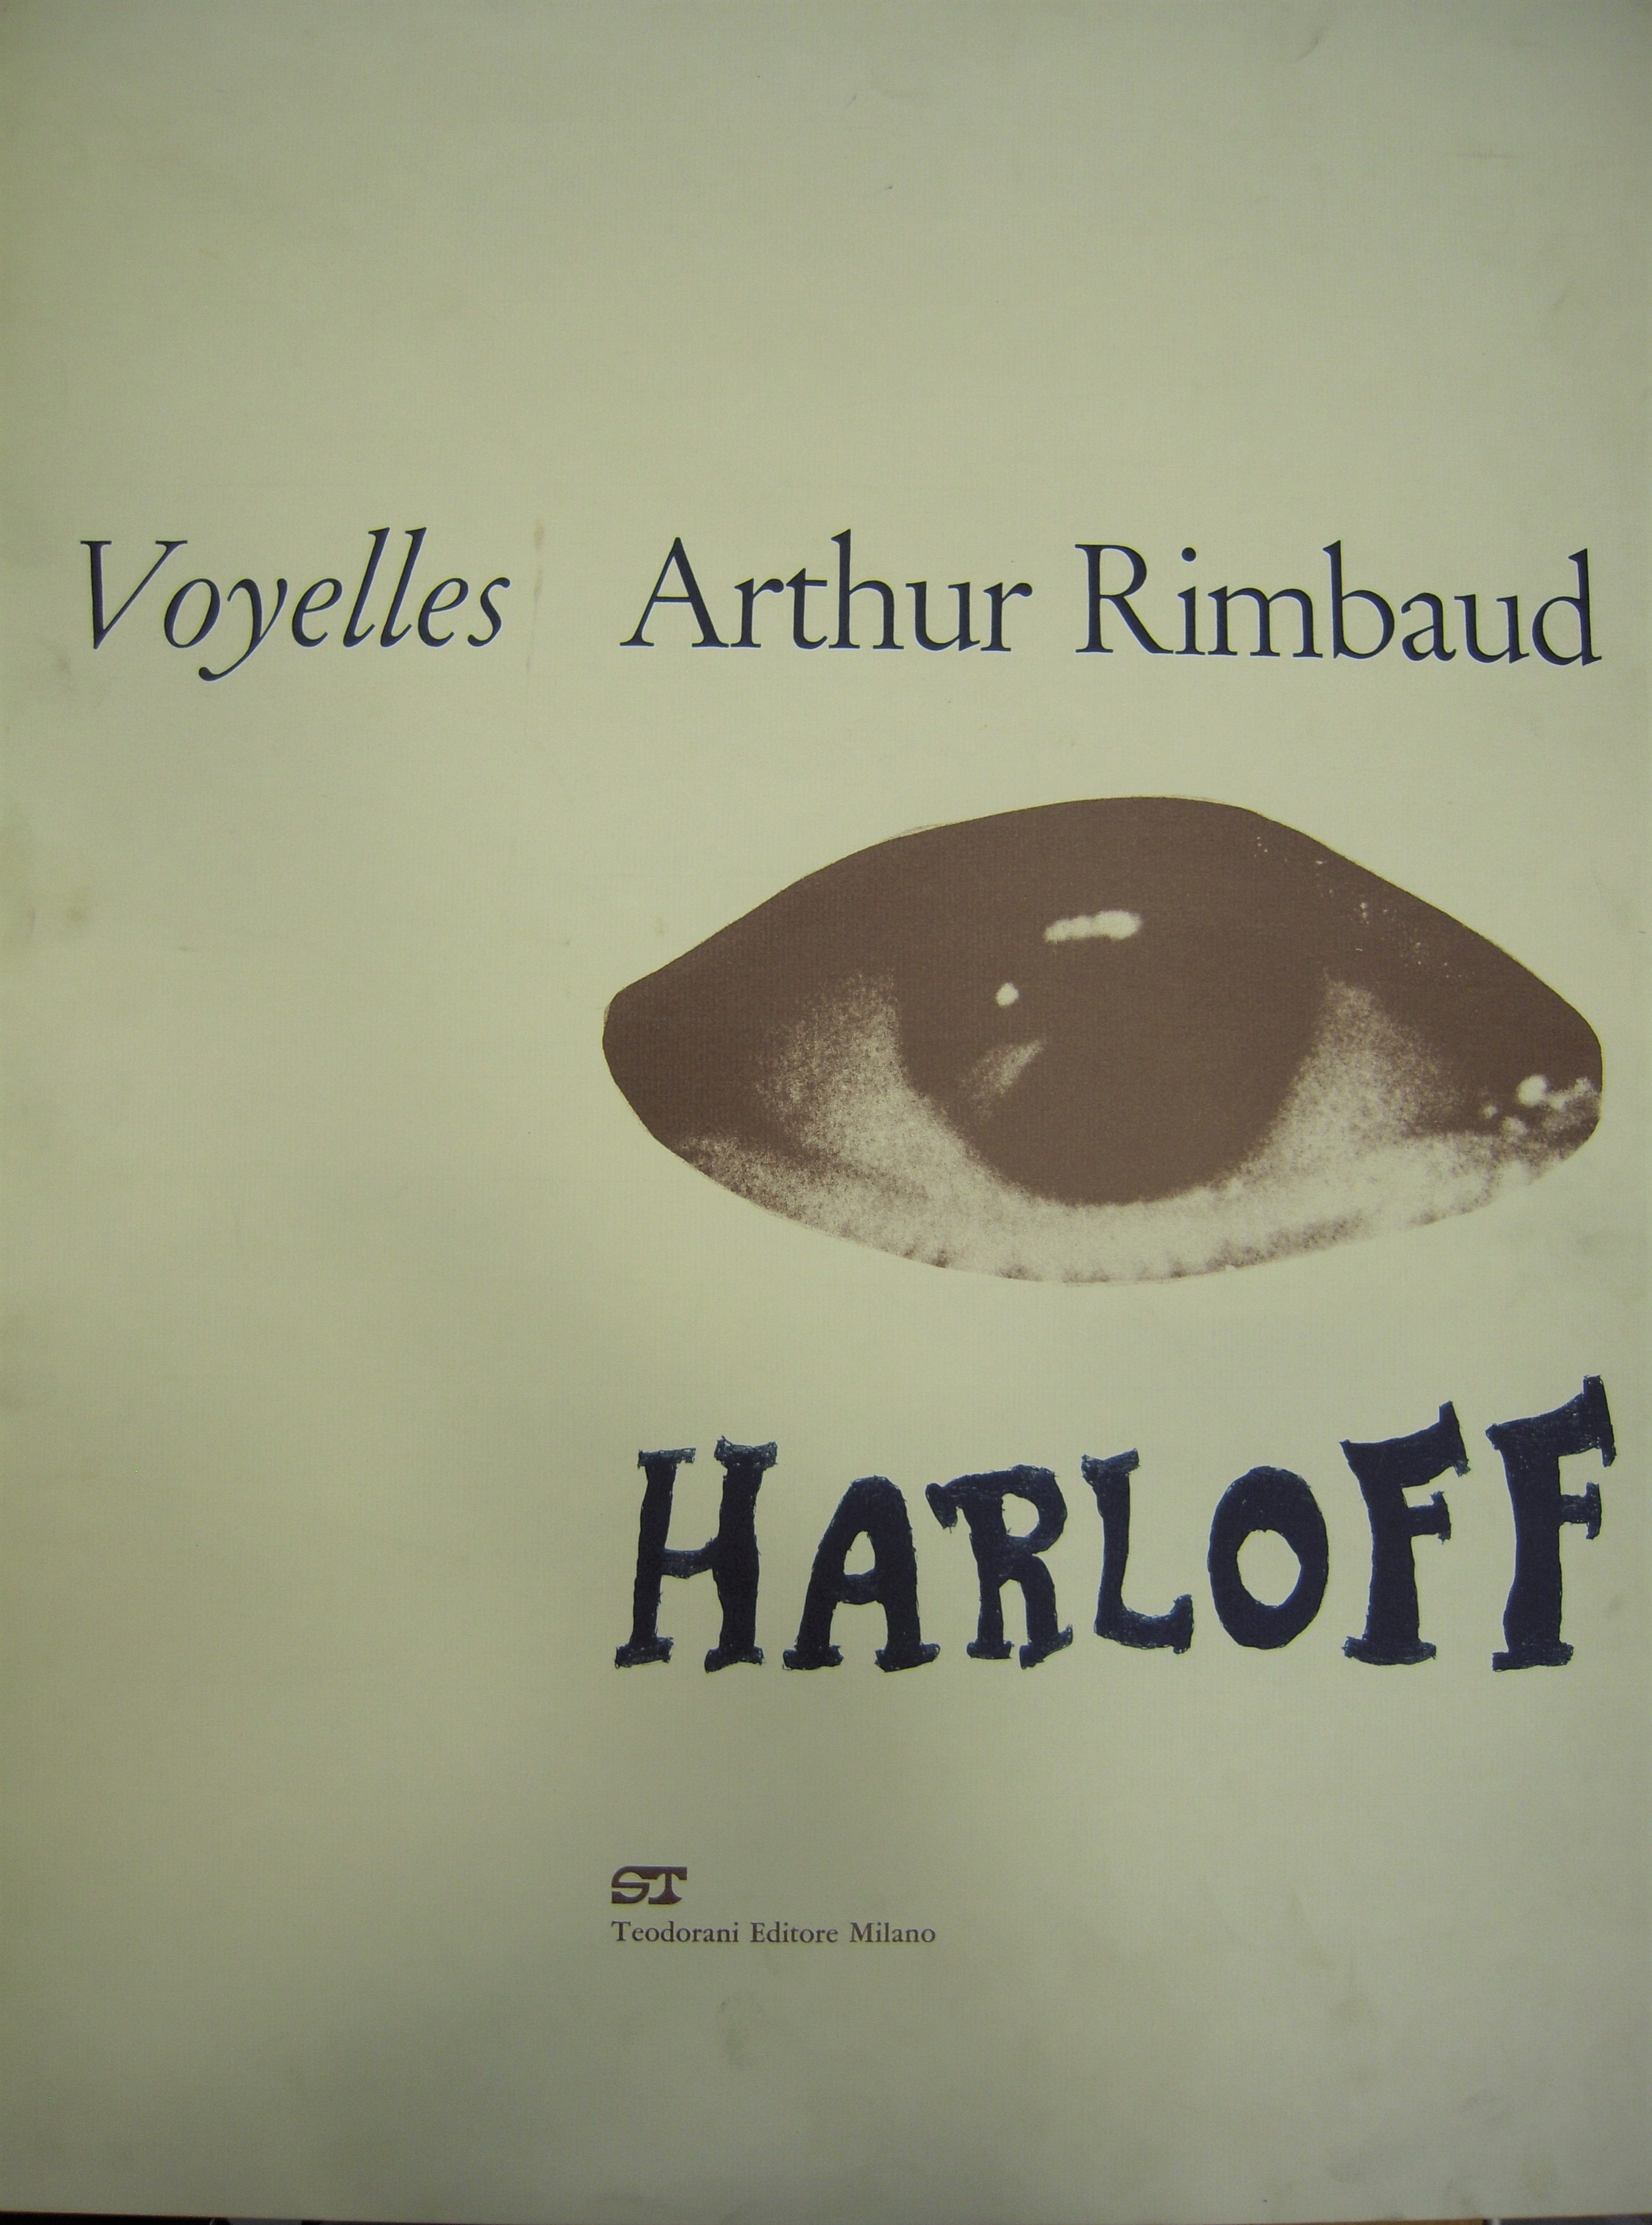 Copertina Libro Rimbaud 1A